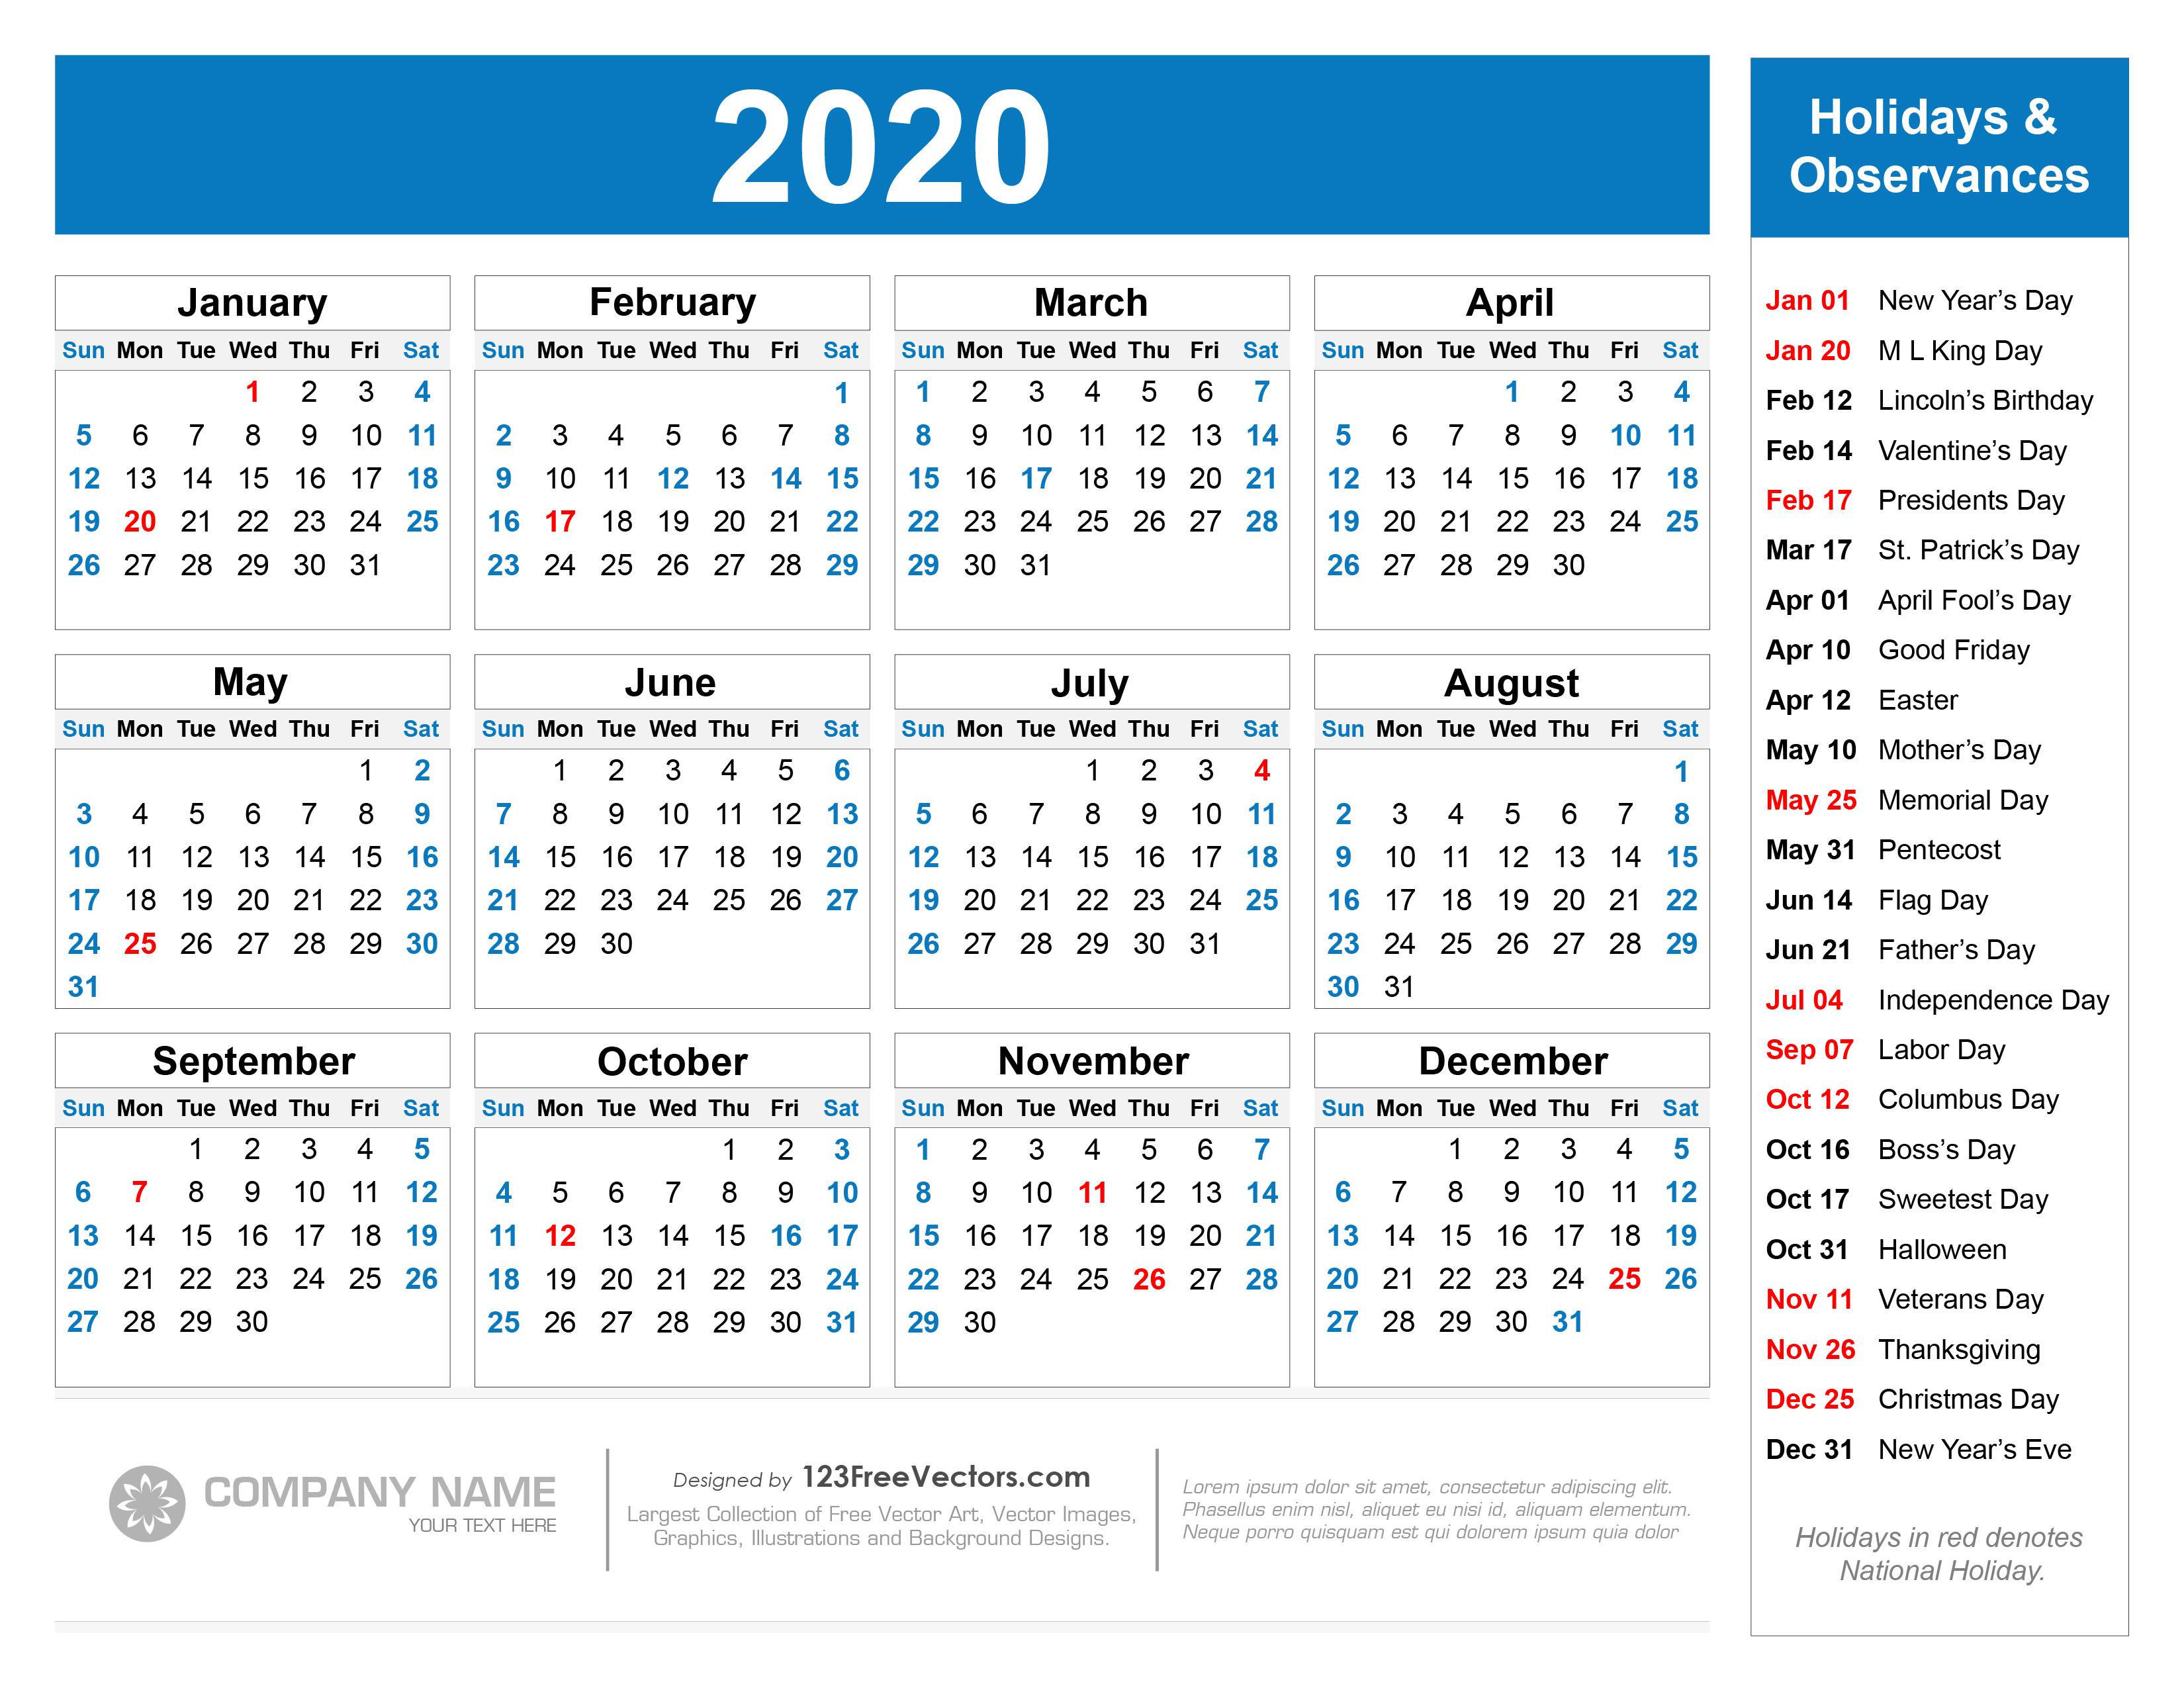 Free Printable 2020 Calendar With Holidays pertaining to Printable 2020 Calander